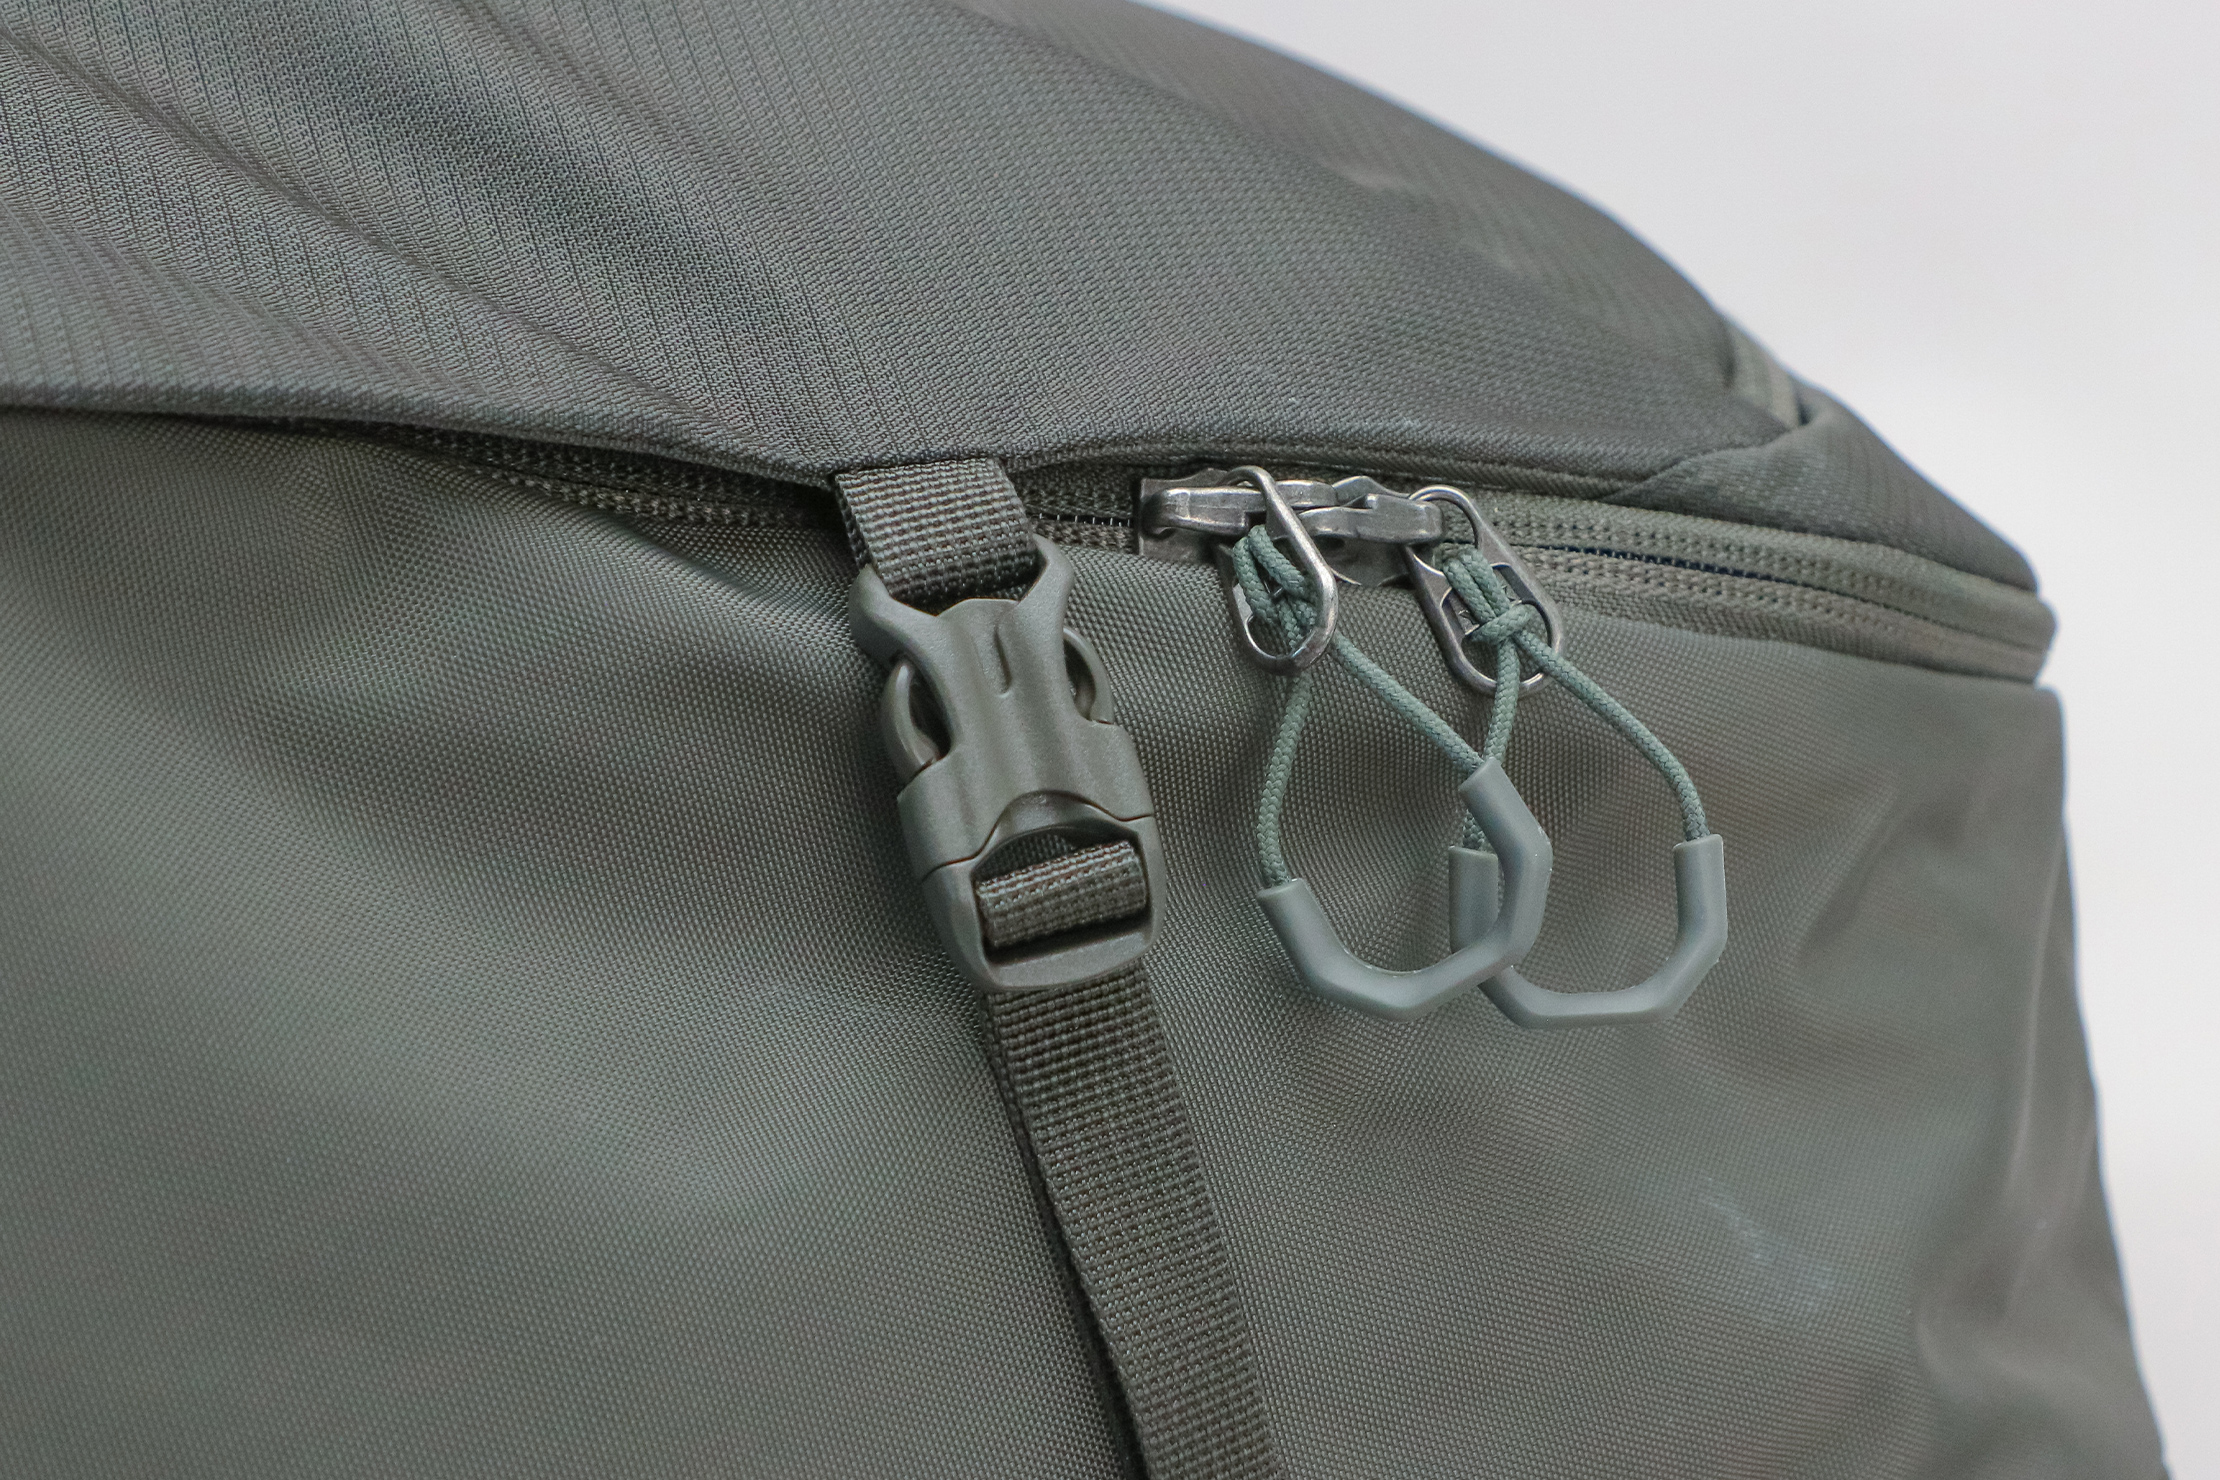 Gregory Detour 40 Backpack Zipper Pulls And Compression